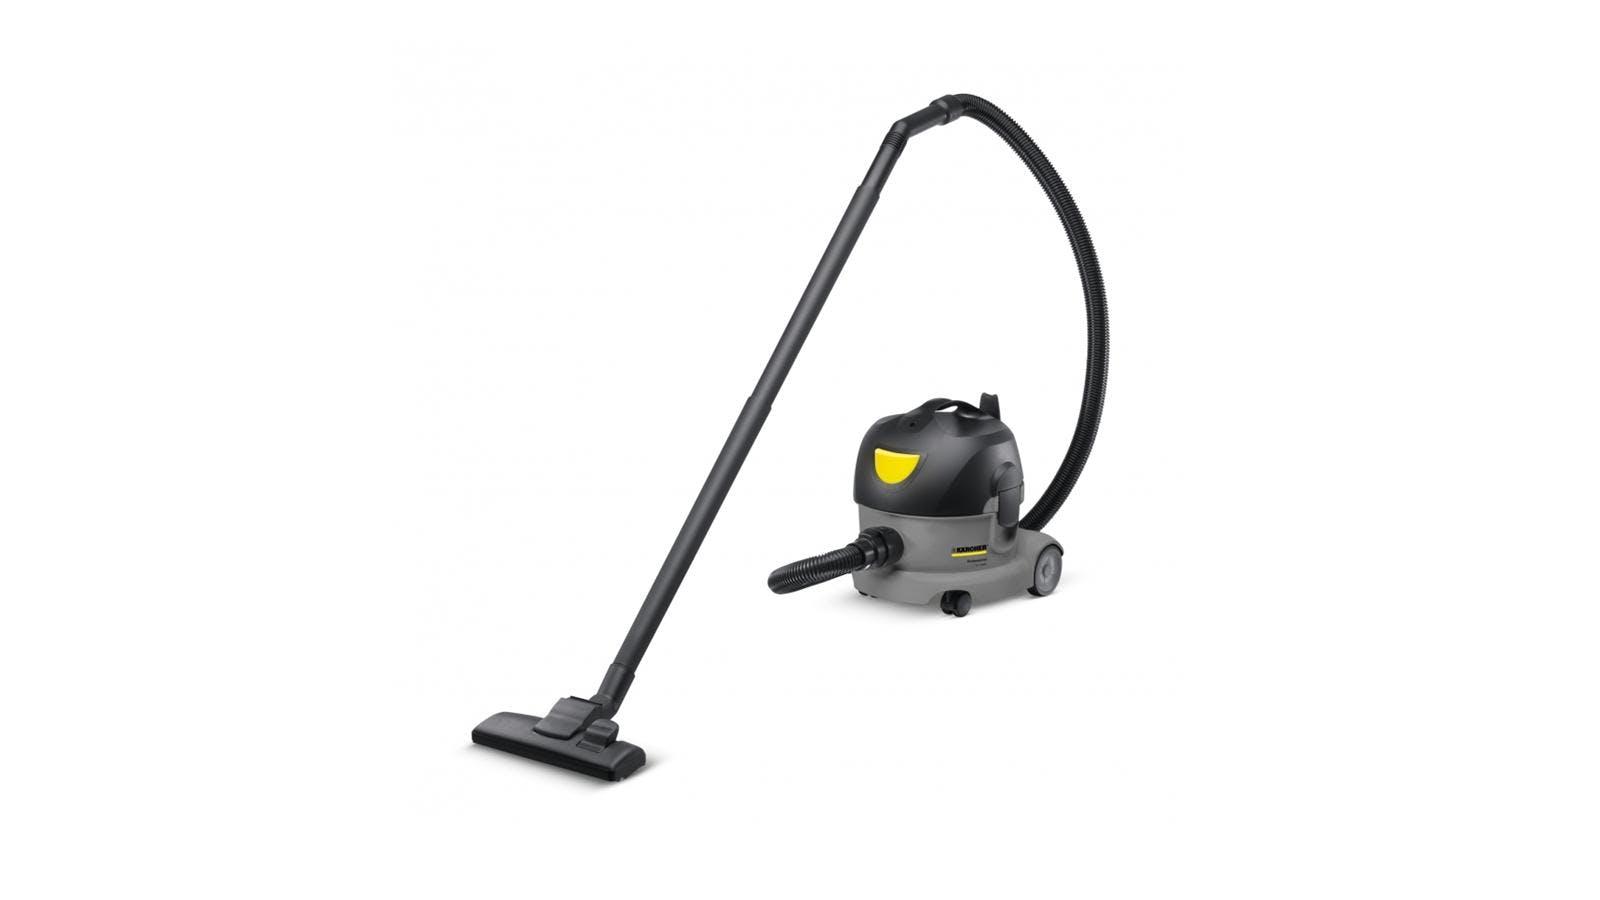 Karcher T 8 1 Dry Vacuum Cleaner